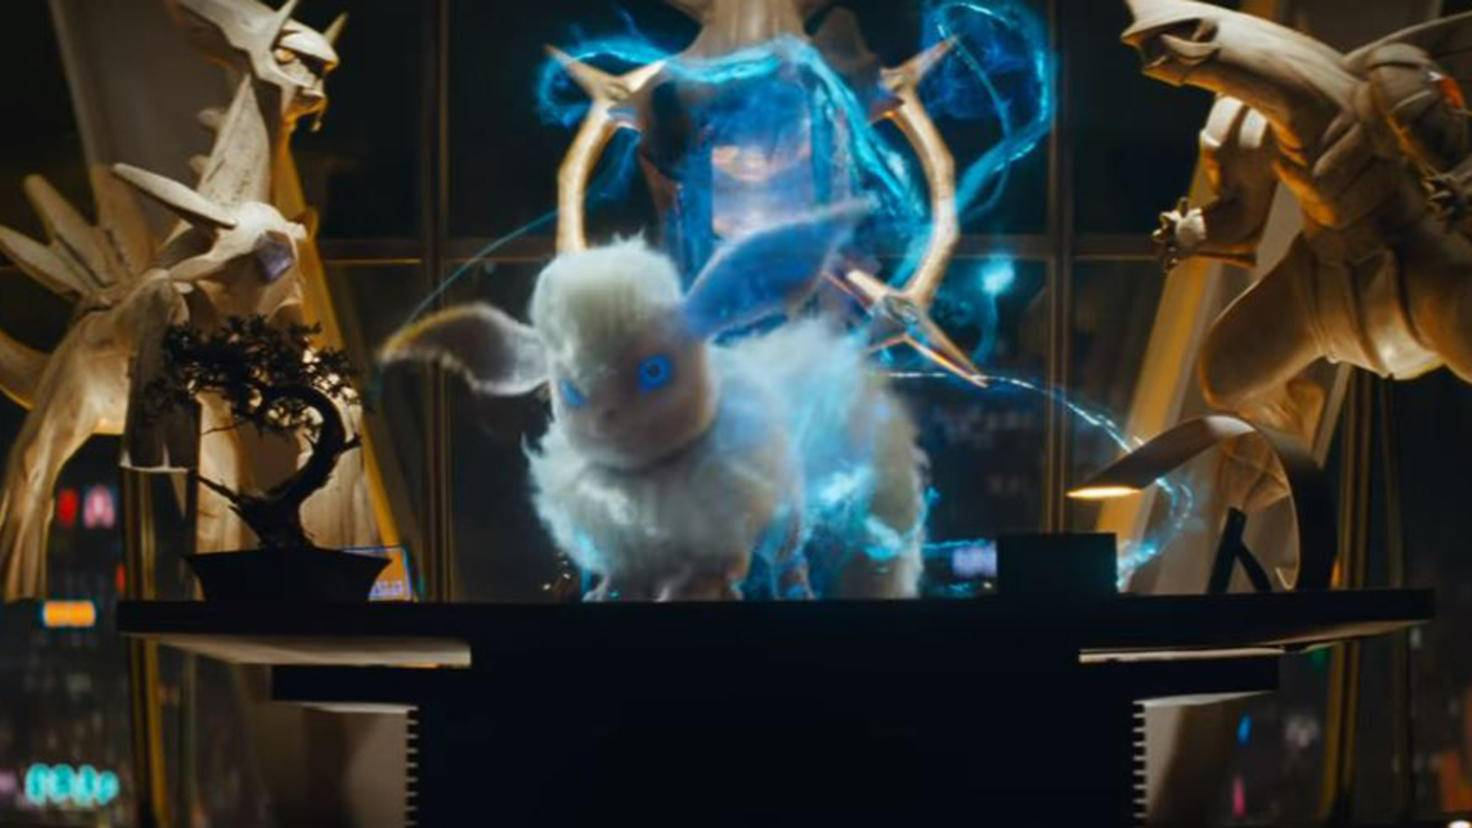 Flamara in Pokémon Meisterdetektiv Pikachu Trailer 2